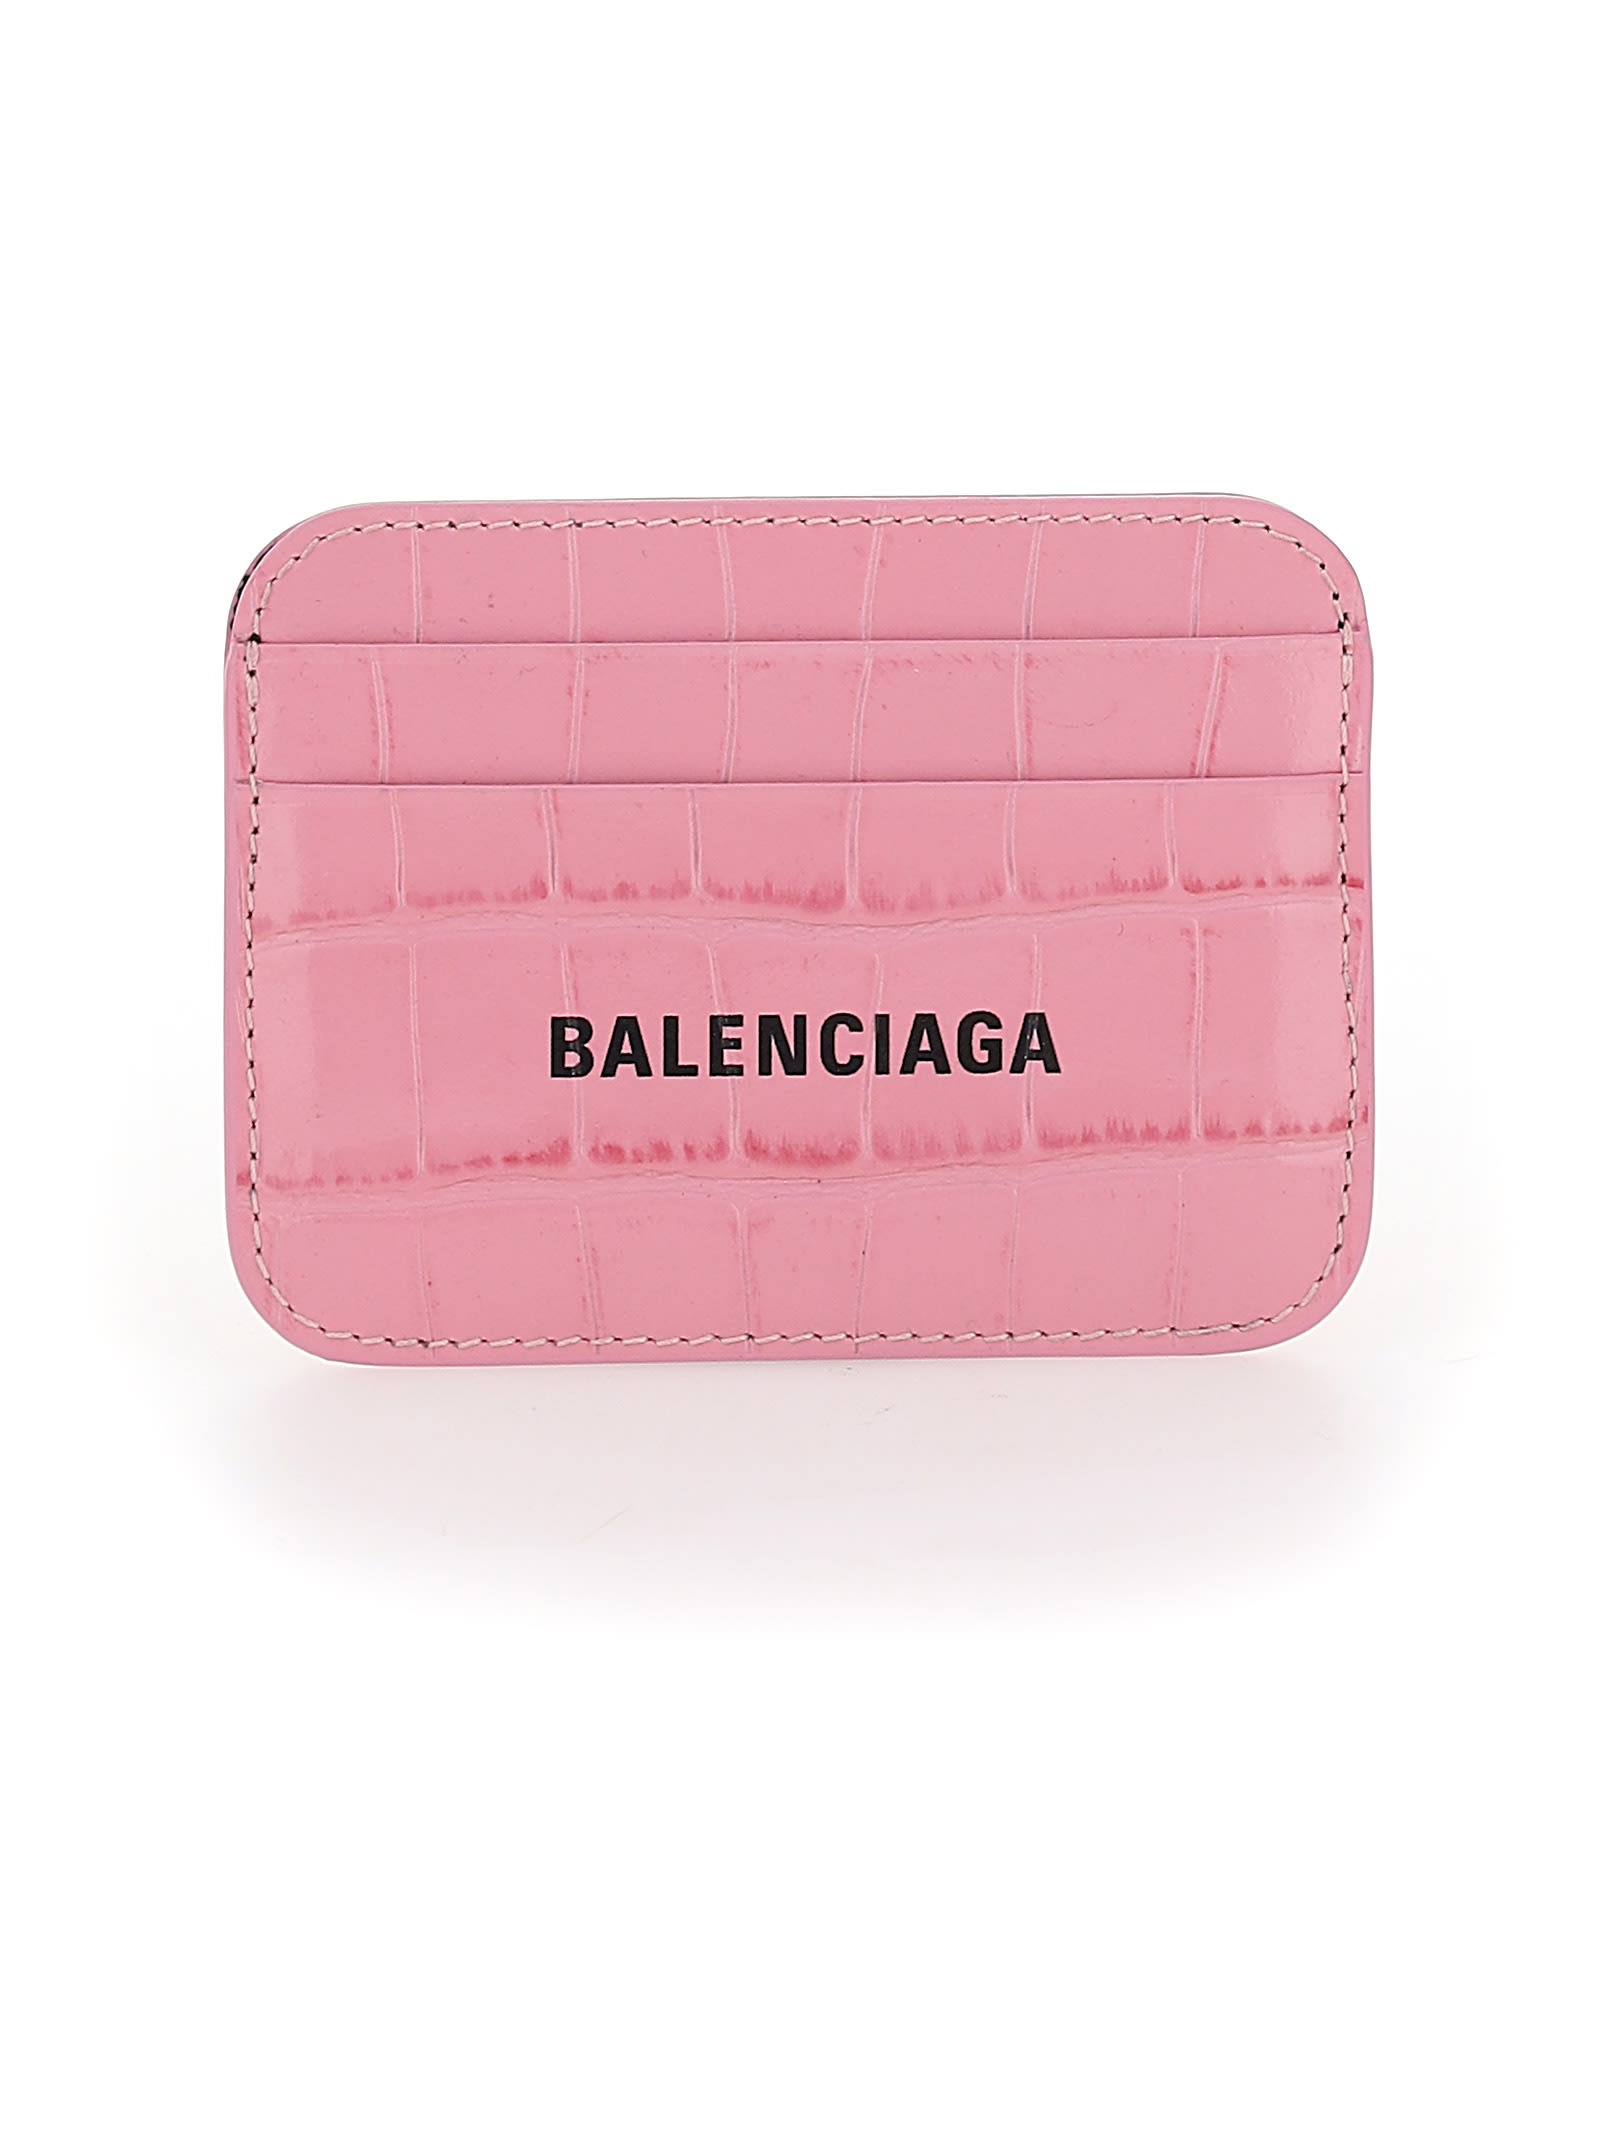 Balenciaga Cardholders CARD HOLDER